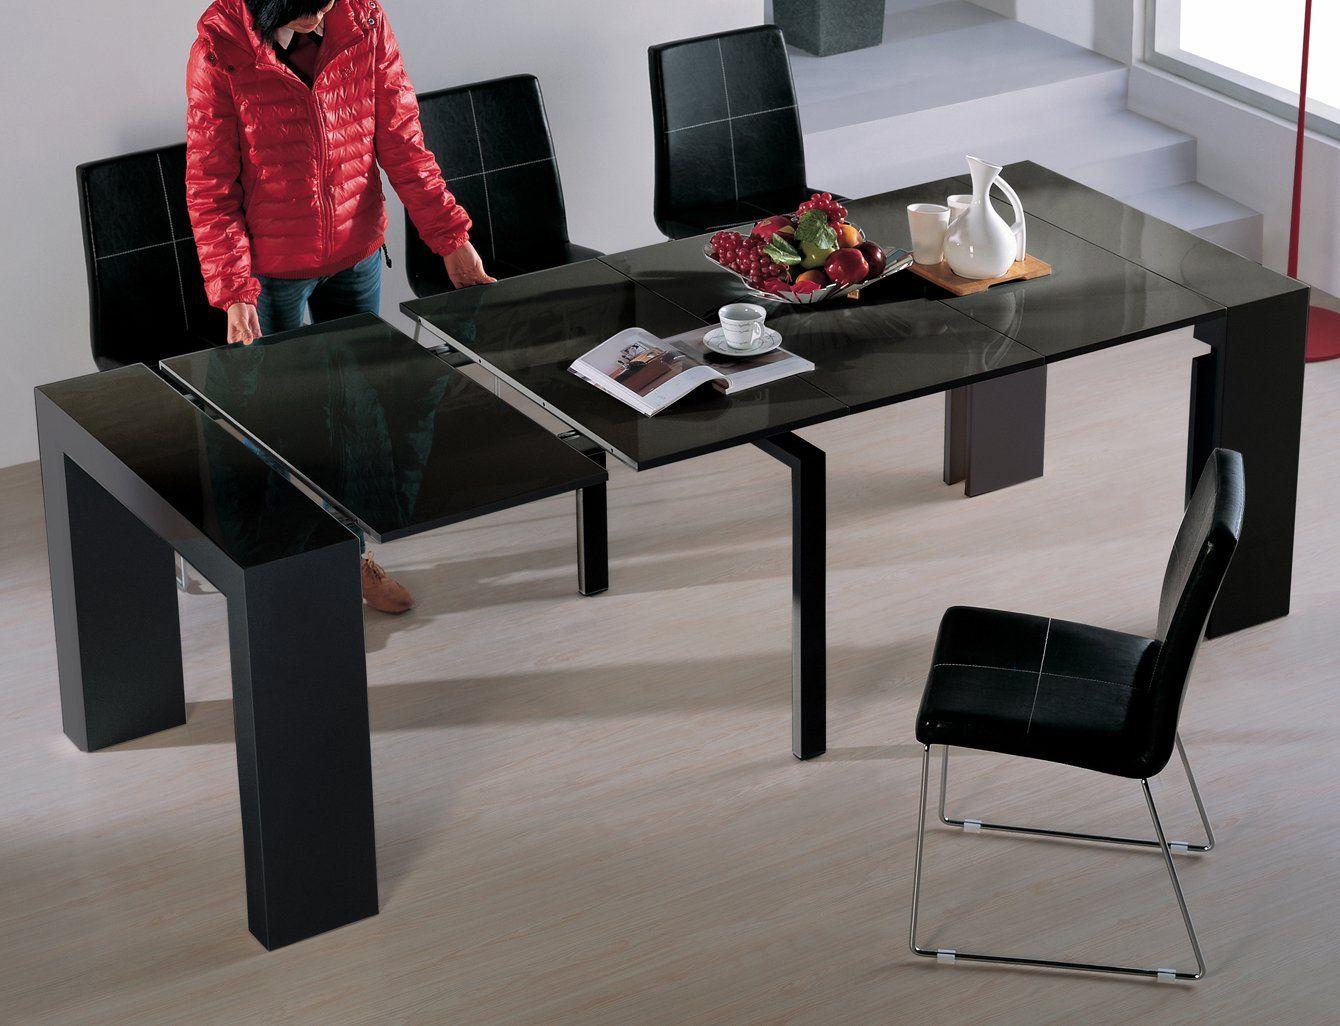 Viva Home H 1003bg Audrey Dining Table Black Gloss Dining Table